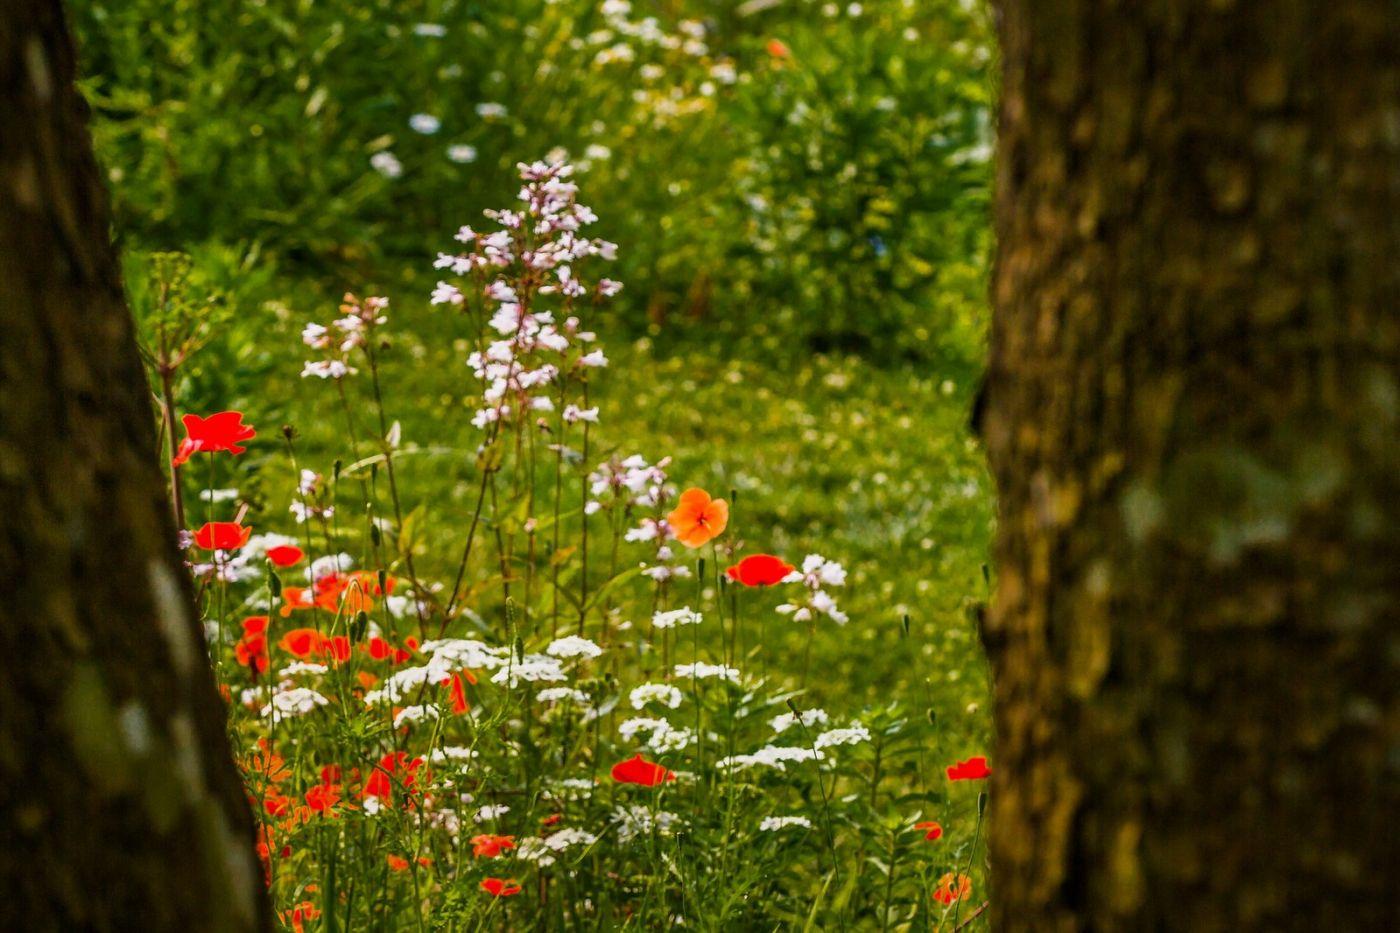 Chanticleer花园,有梦想的季节_图1-6